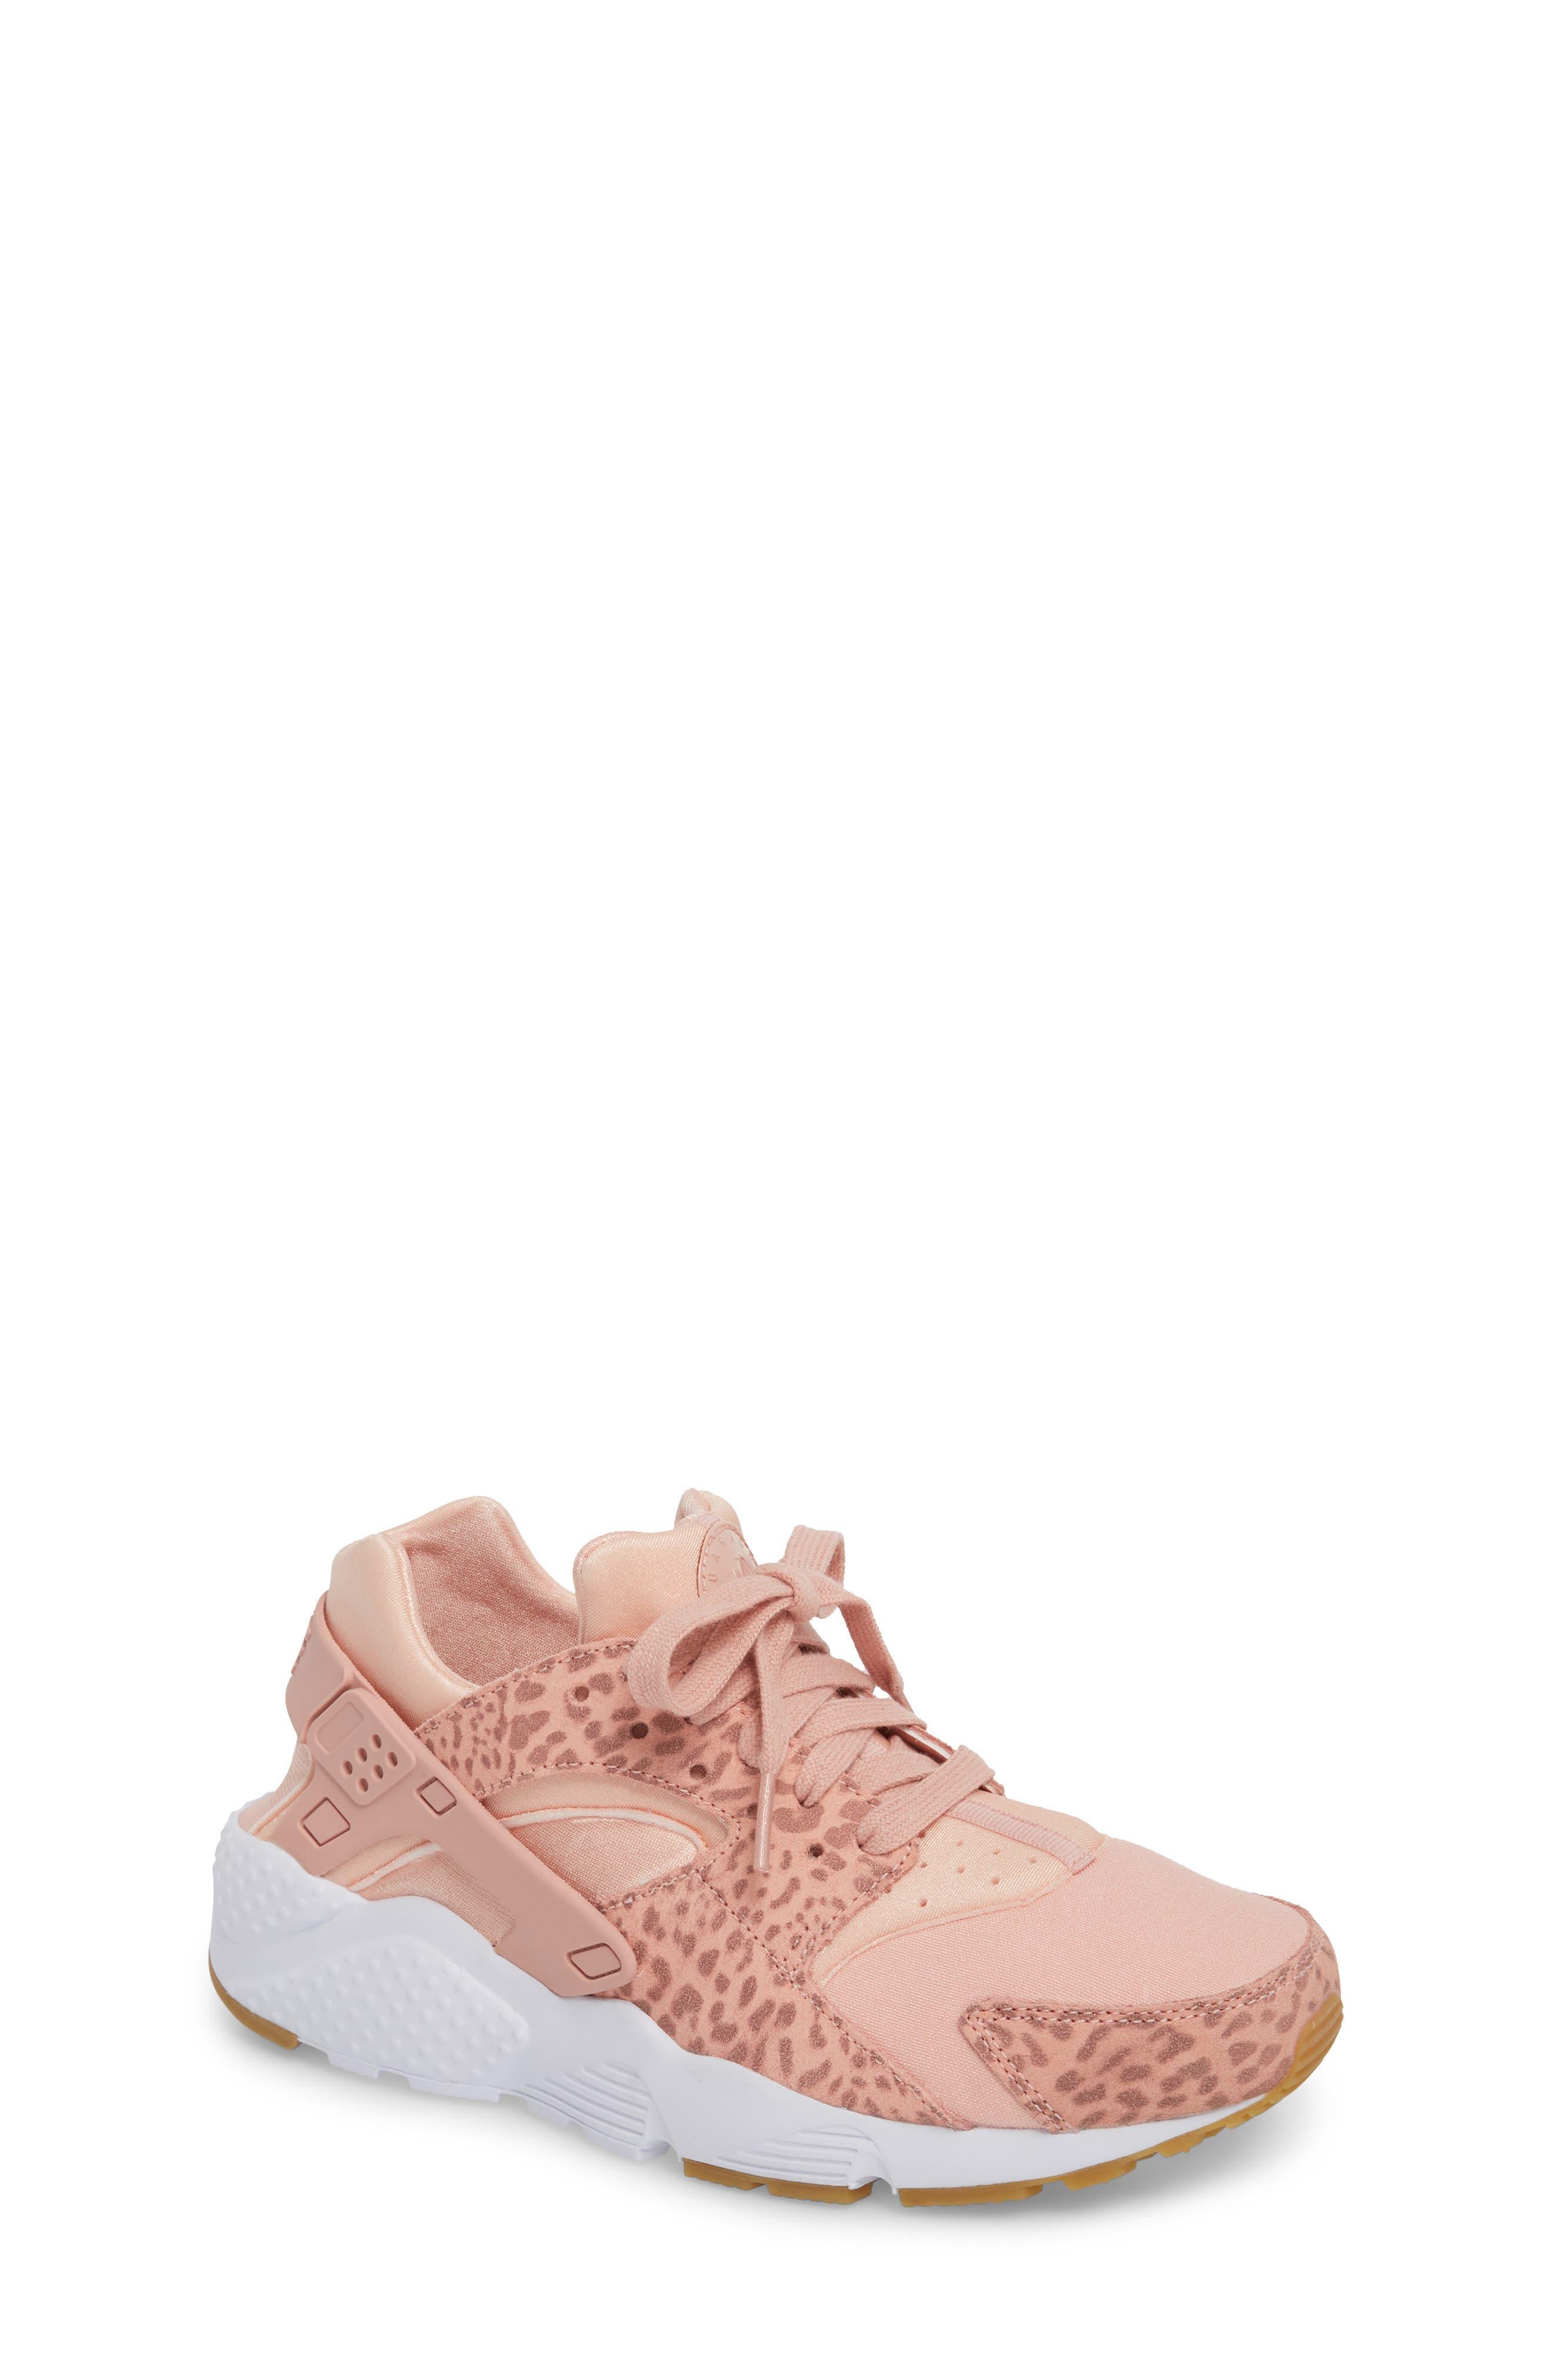 Huarache Run SE Sneaker,                             Main thumbnail 1, color,                             Coral Stardust/ Rust Pink/ Gum